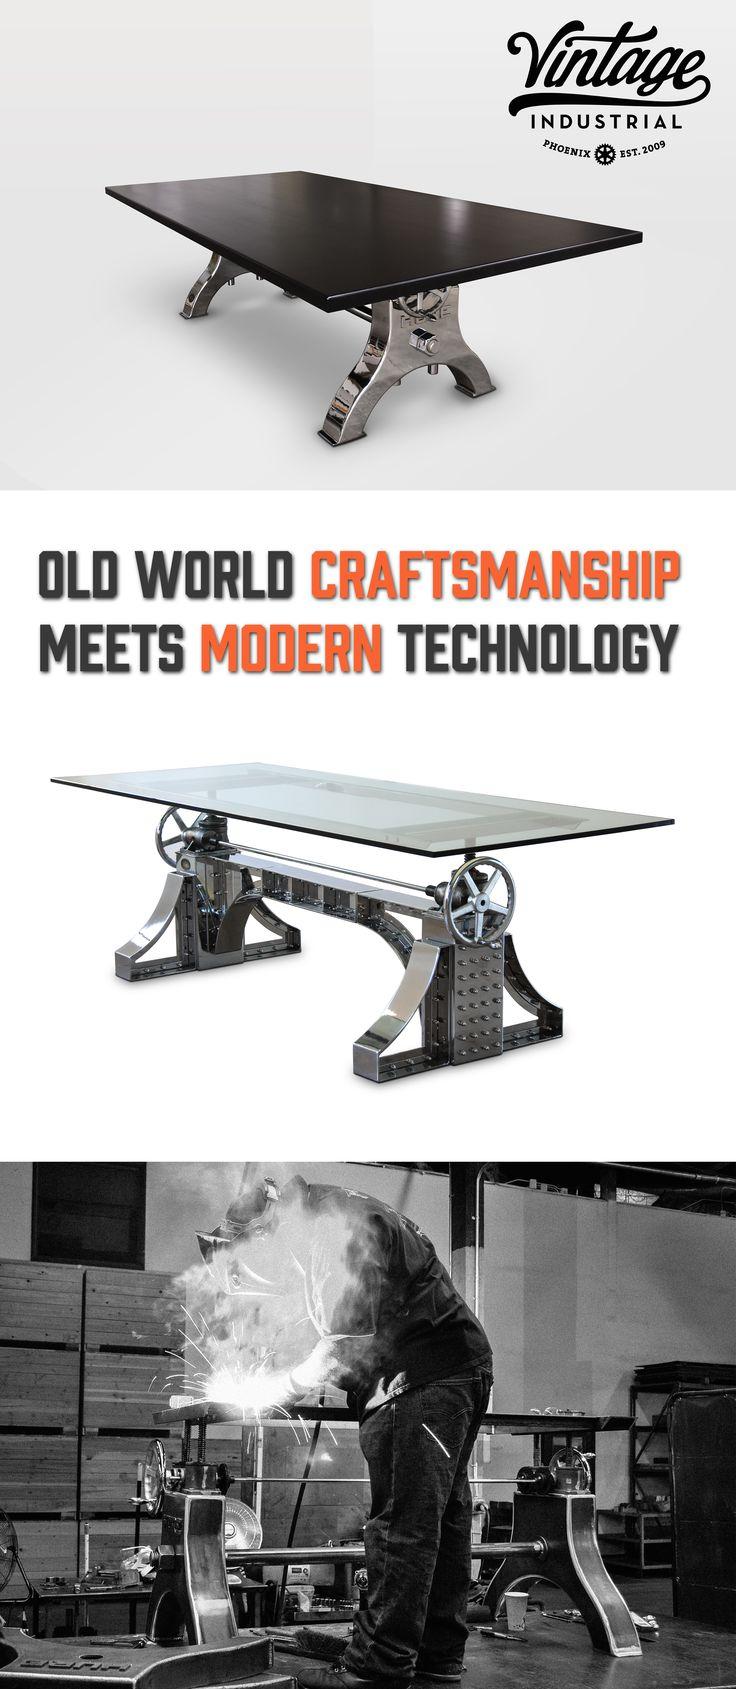 Post industrial conference table vintage industrial furniture - Helicoid Table Conference Tableorder Andvintage Industrialphoenixships